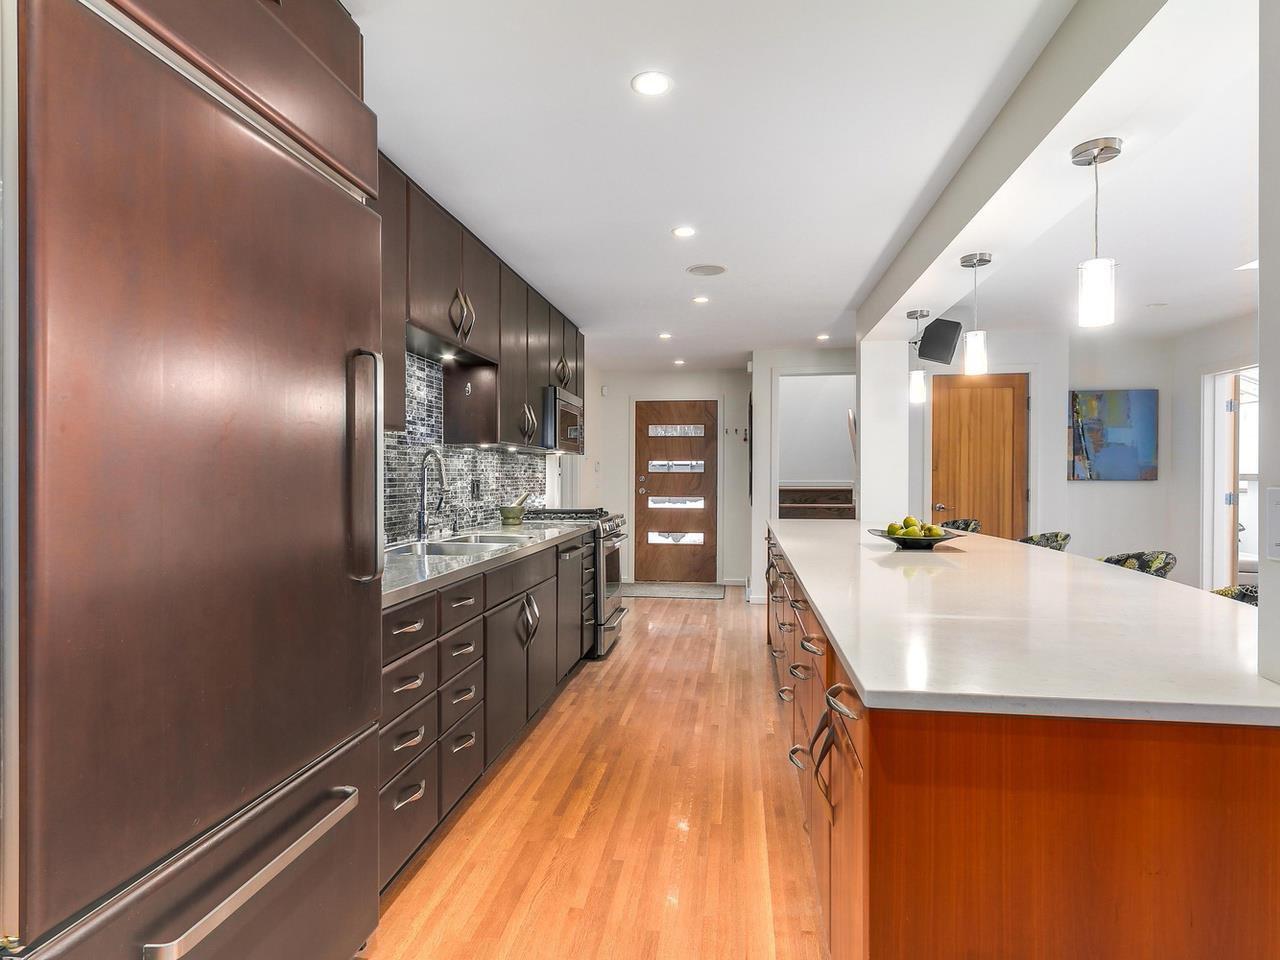 Photo 9: Photos: 3708 EDGEMONT Boulevard in North Vancouver: Edgemont House Fourplex for sale : MLS®# R2138514